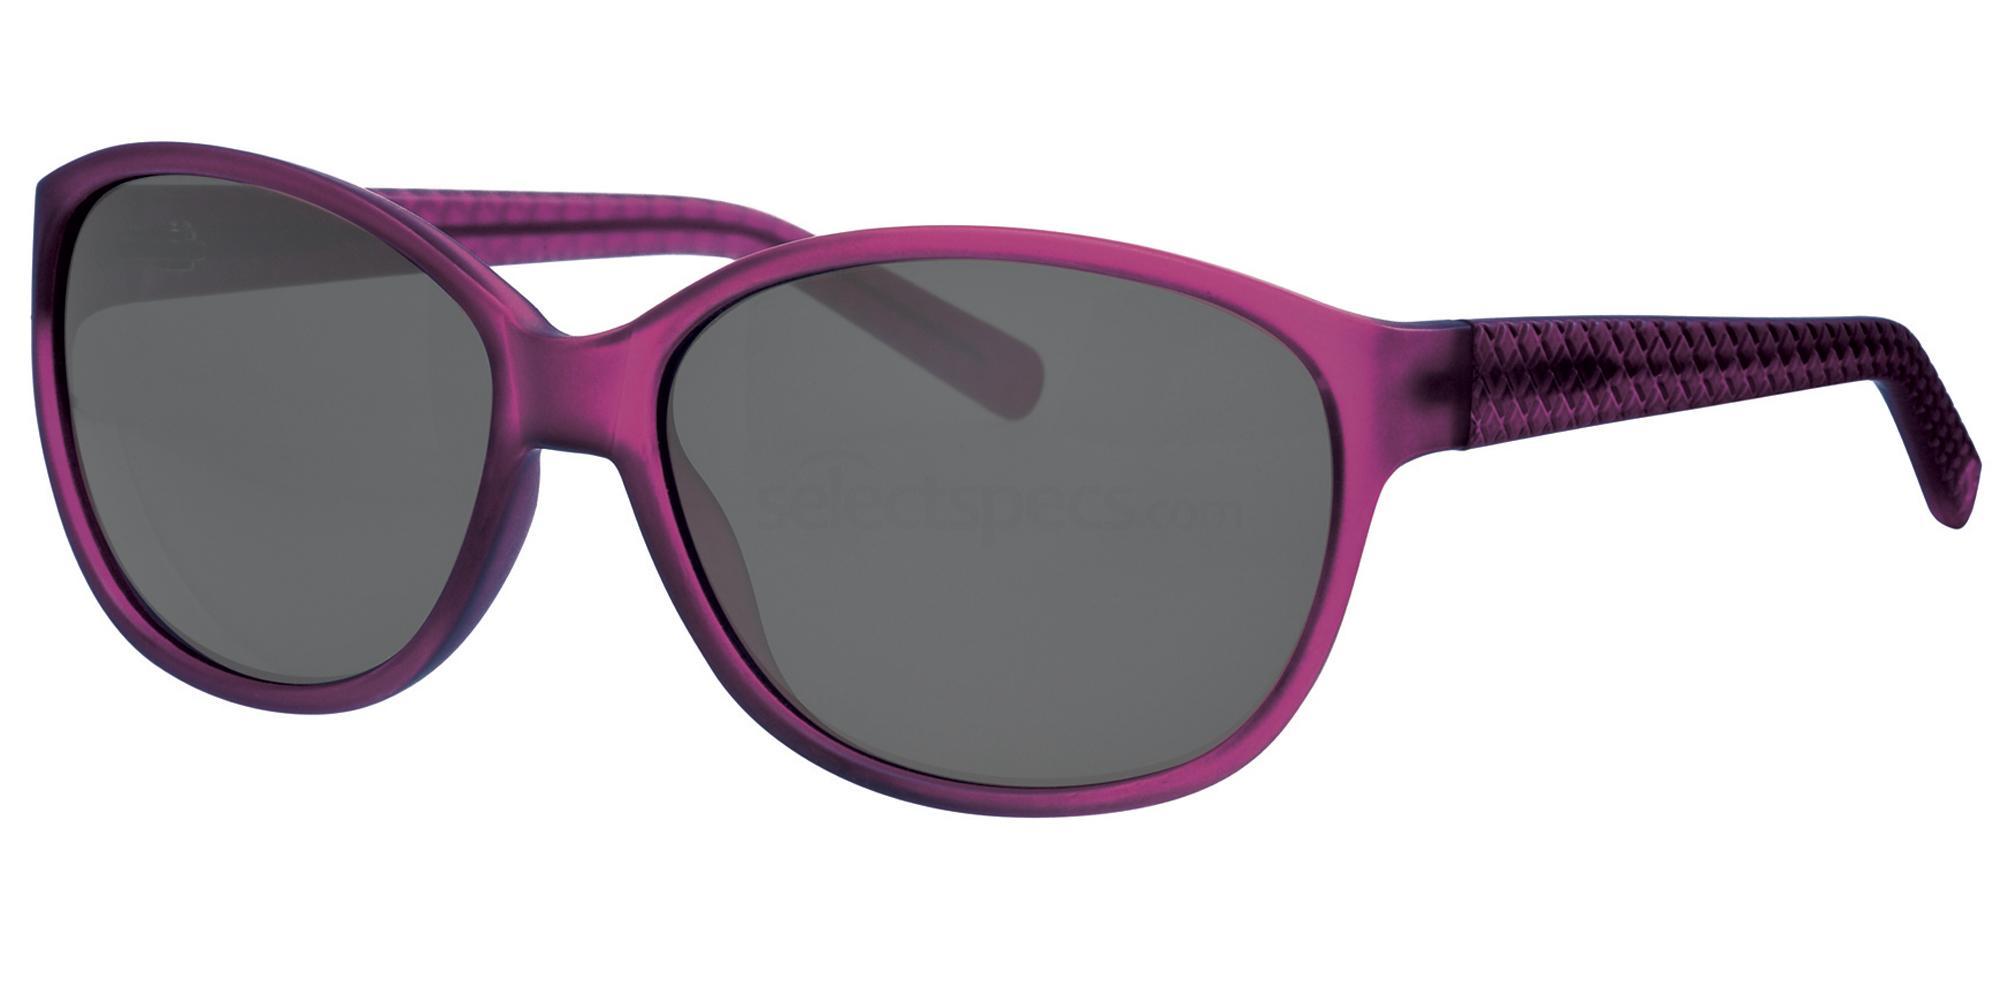 C01 VS193 Sunglasses, Visage